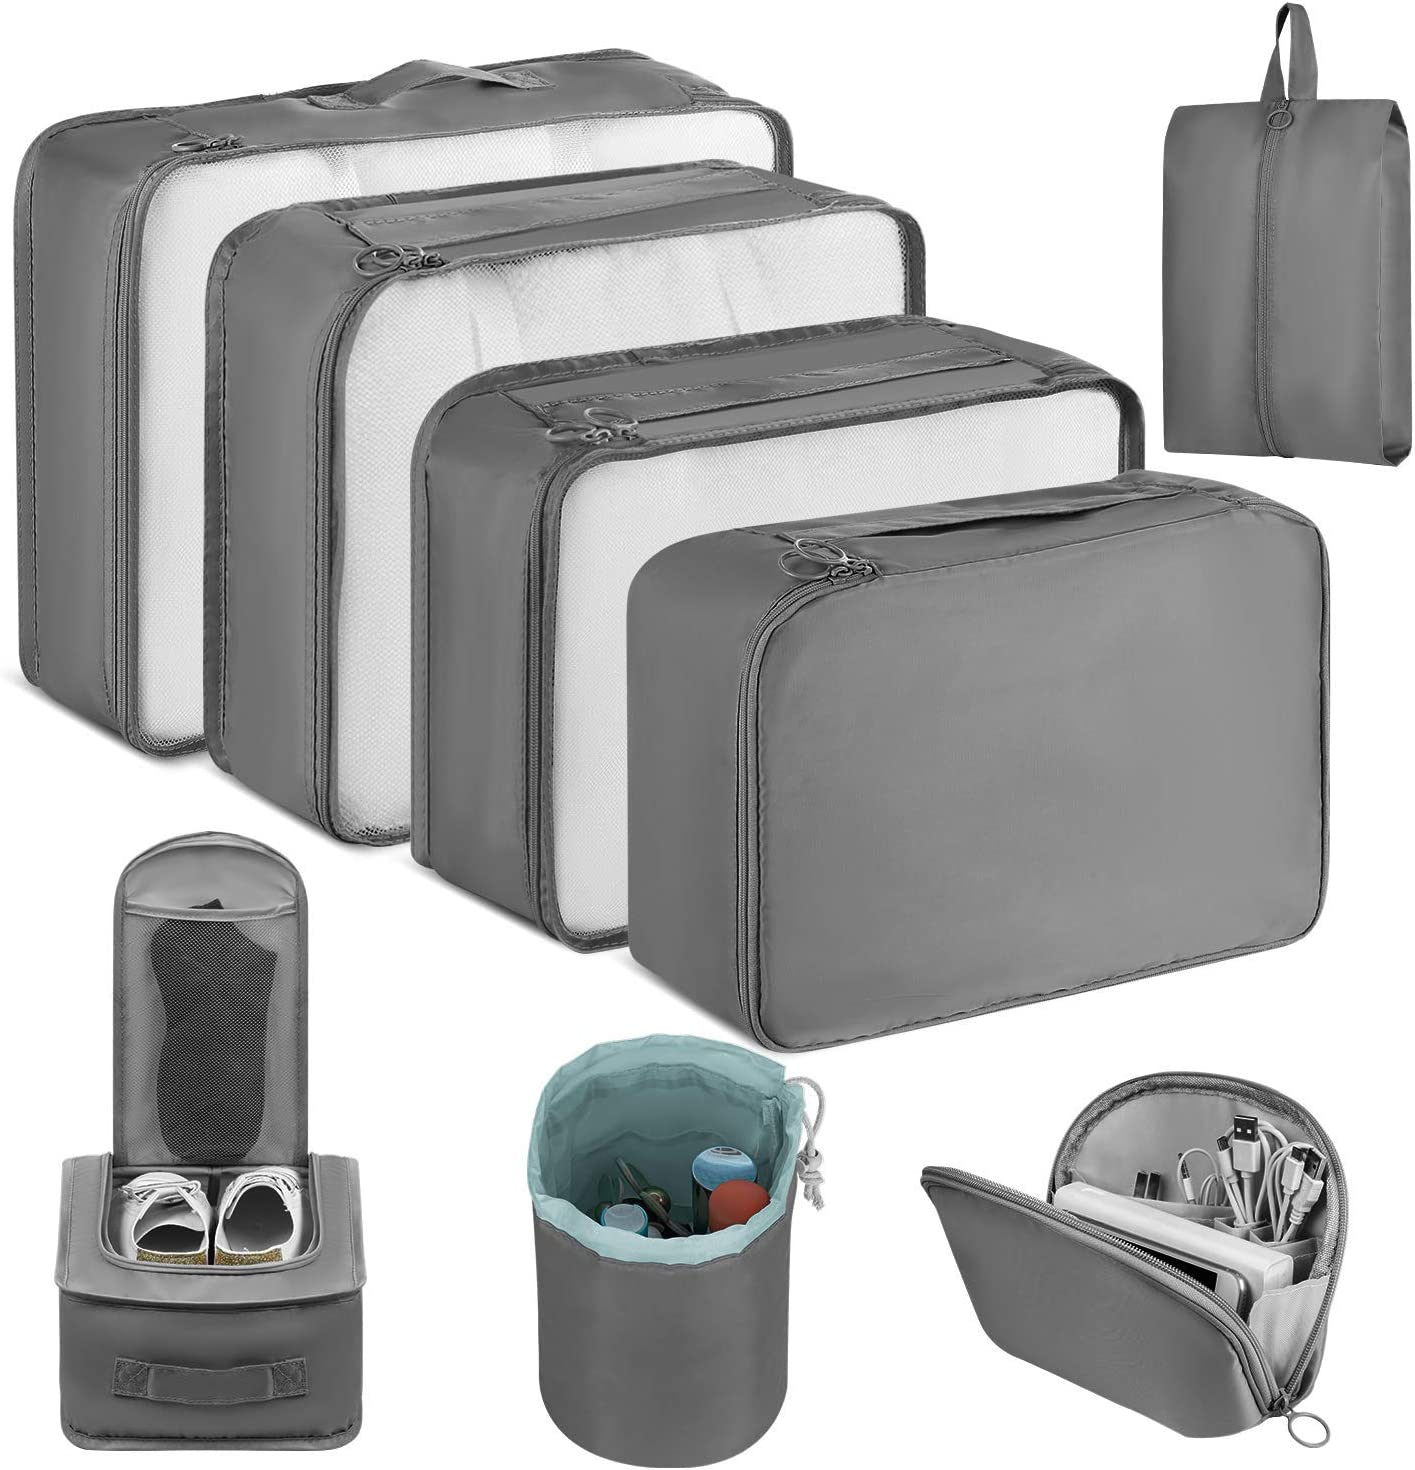 Newdora 8 en 1 Set de Organizador de Equipaje Viaje con Bolsa de Zapato,Impermeable Organizador de Maleta Bolsa para Ropa Sucia de Viaje, Portatrajes de Viaje, Material Nylon